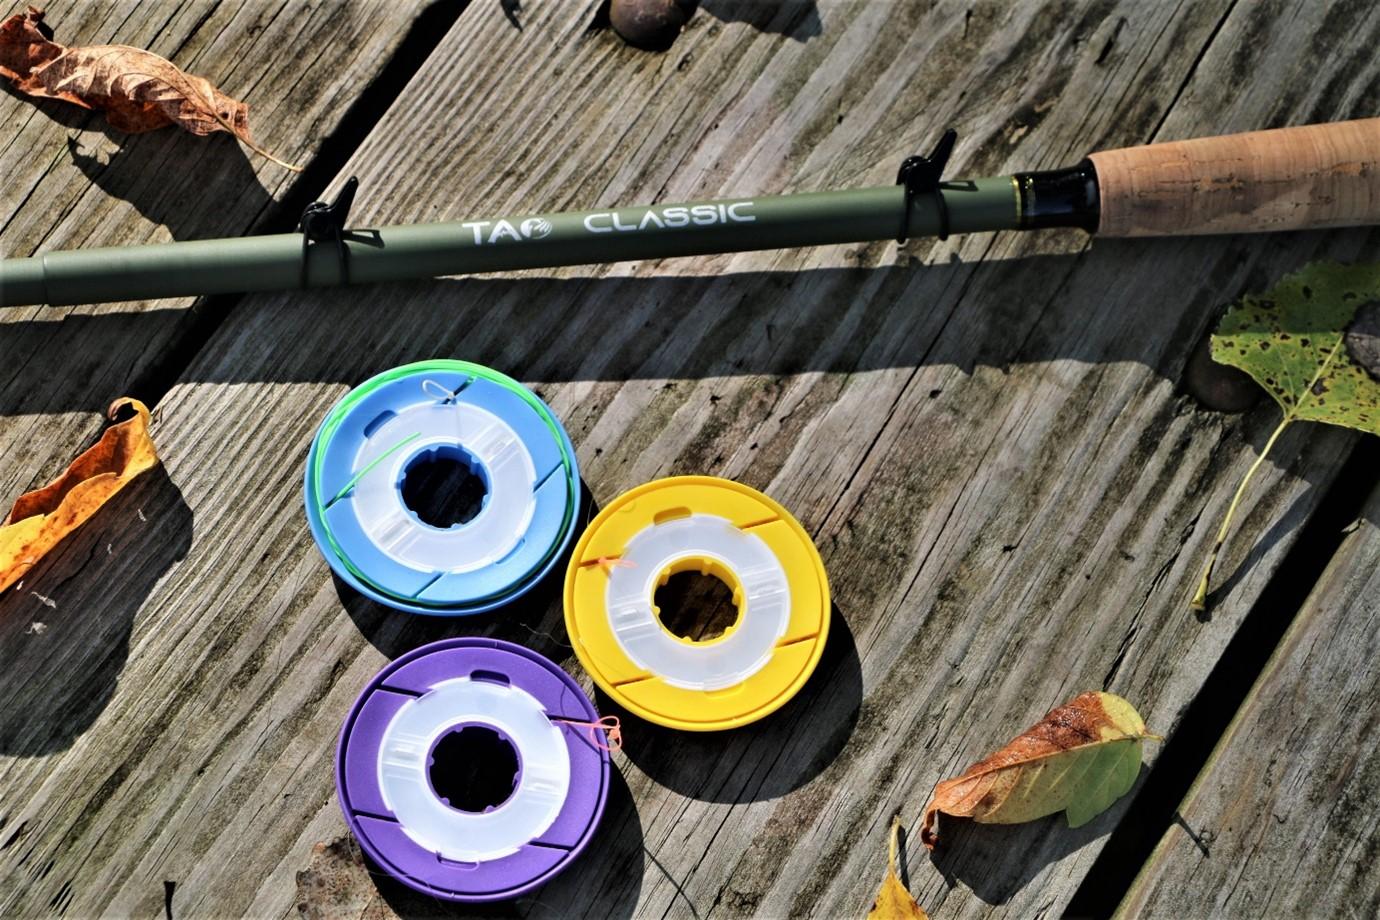 Tenkara Angler Gift Guide - TAO Classic